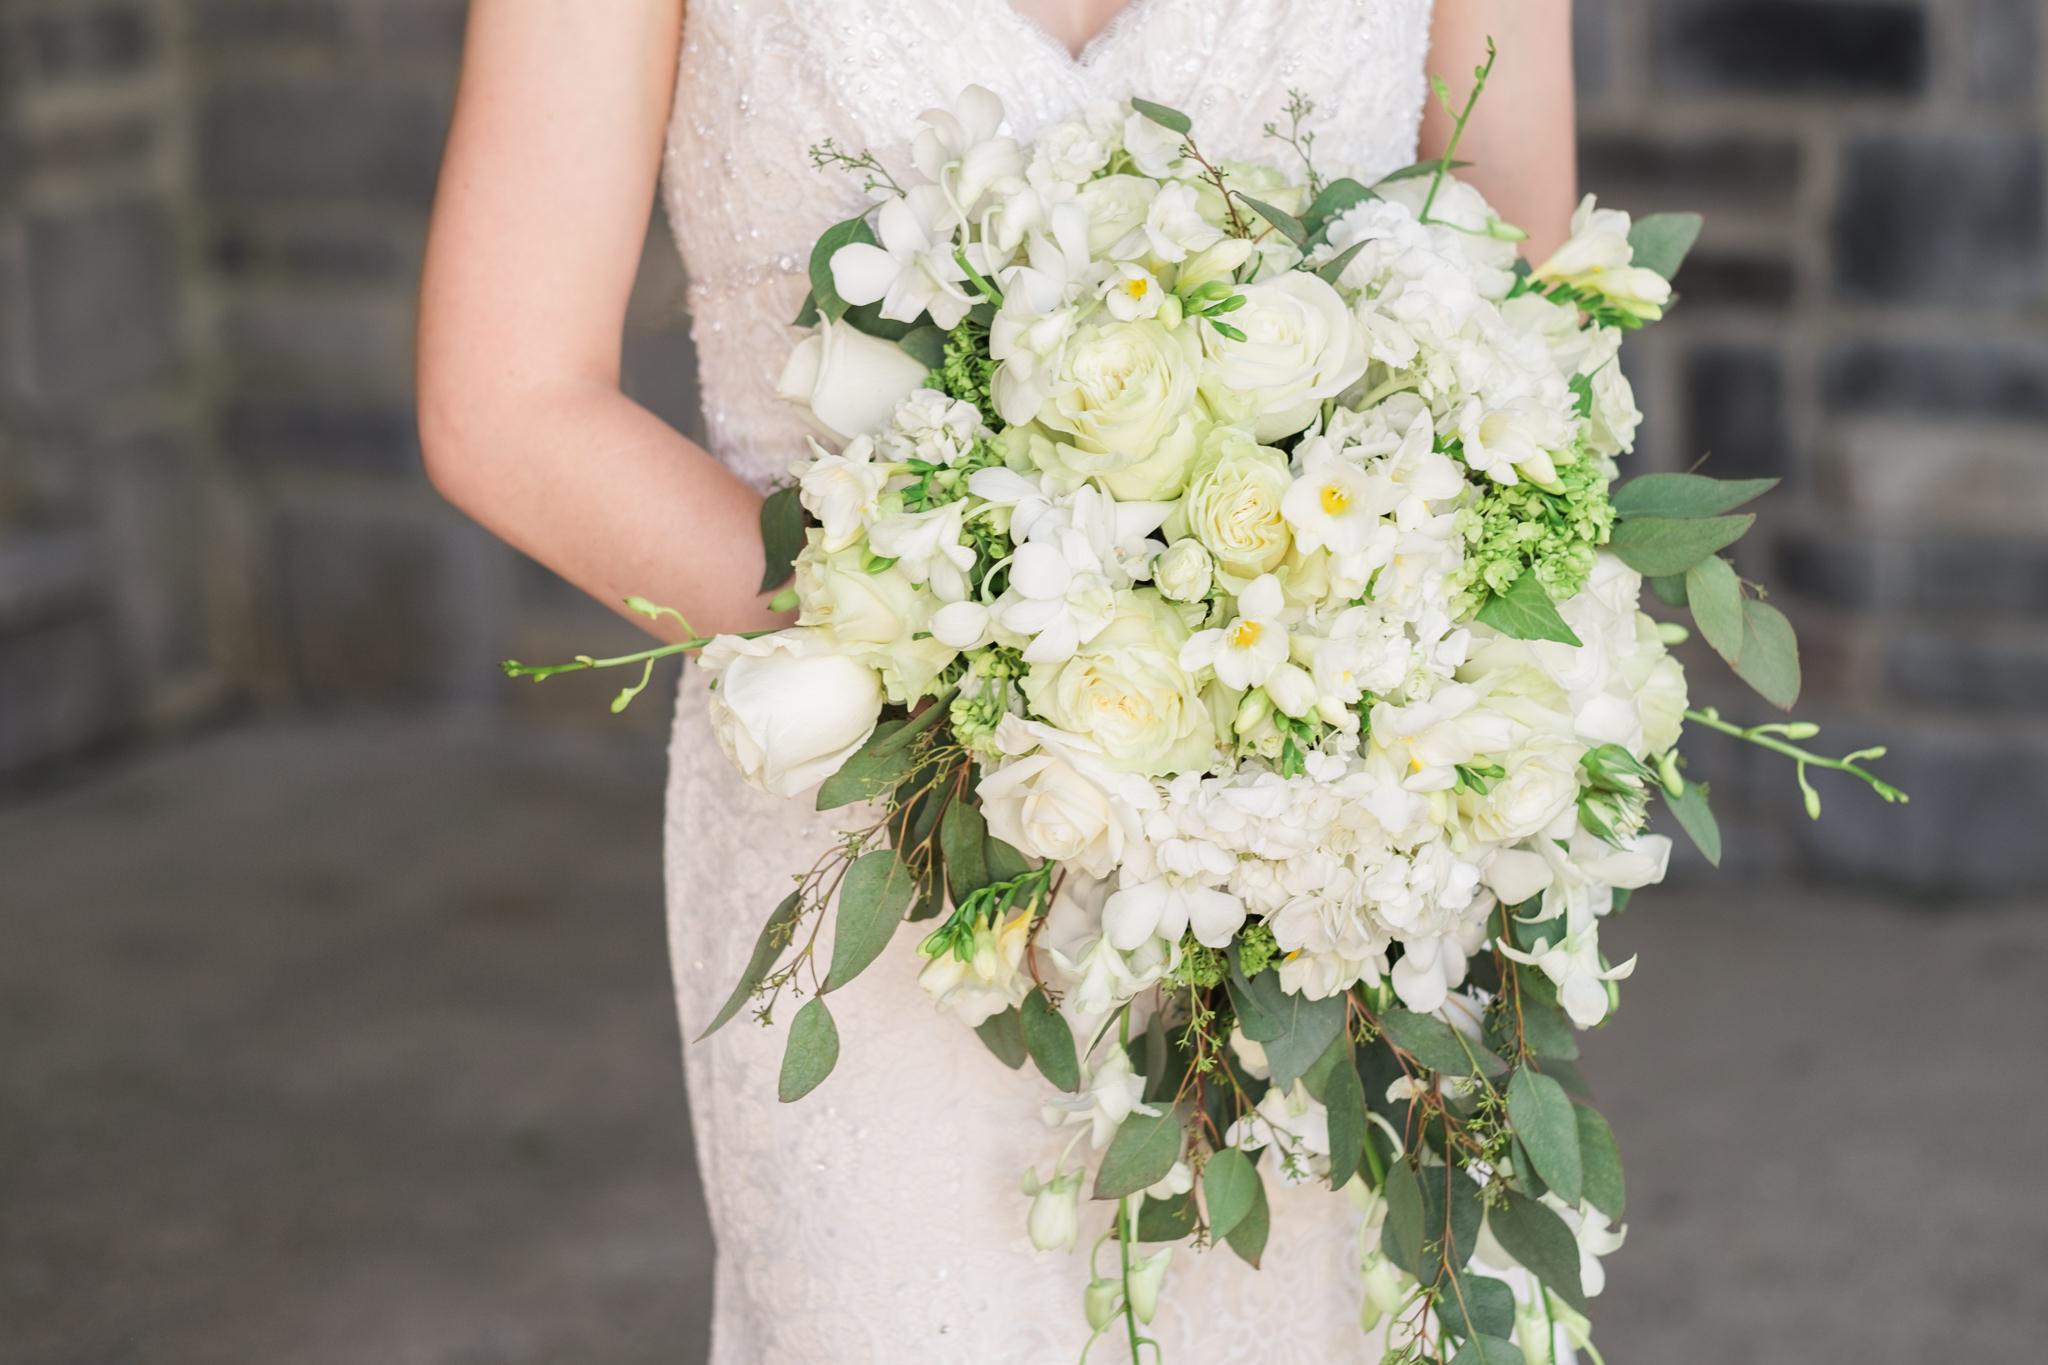 2017.06.03_Callie&Dustin_Wedding_Blog_0012.jpg